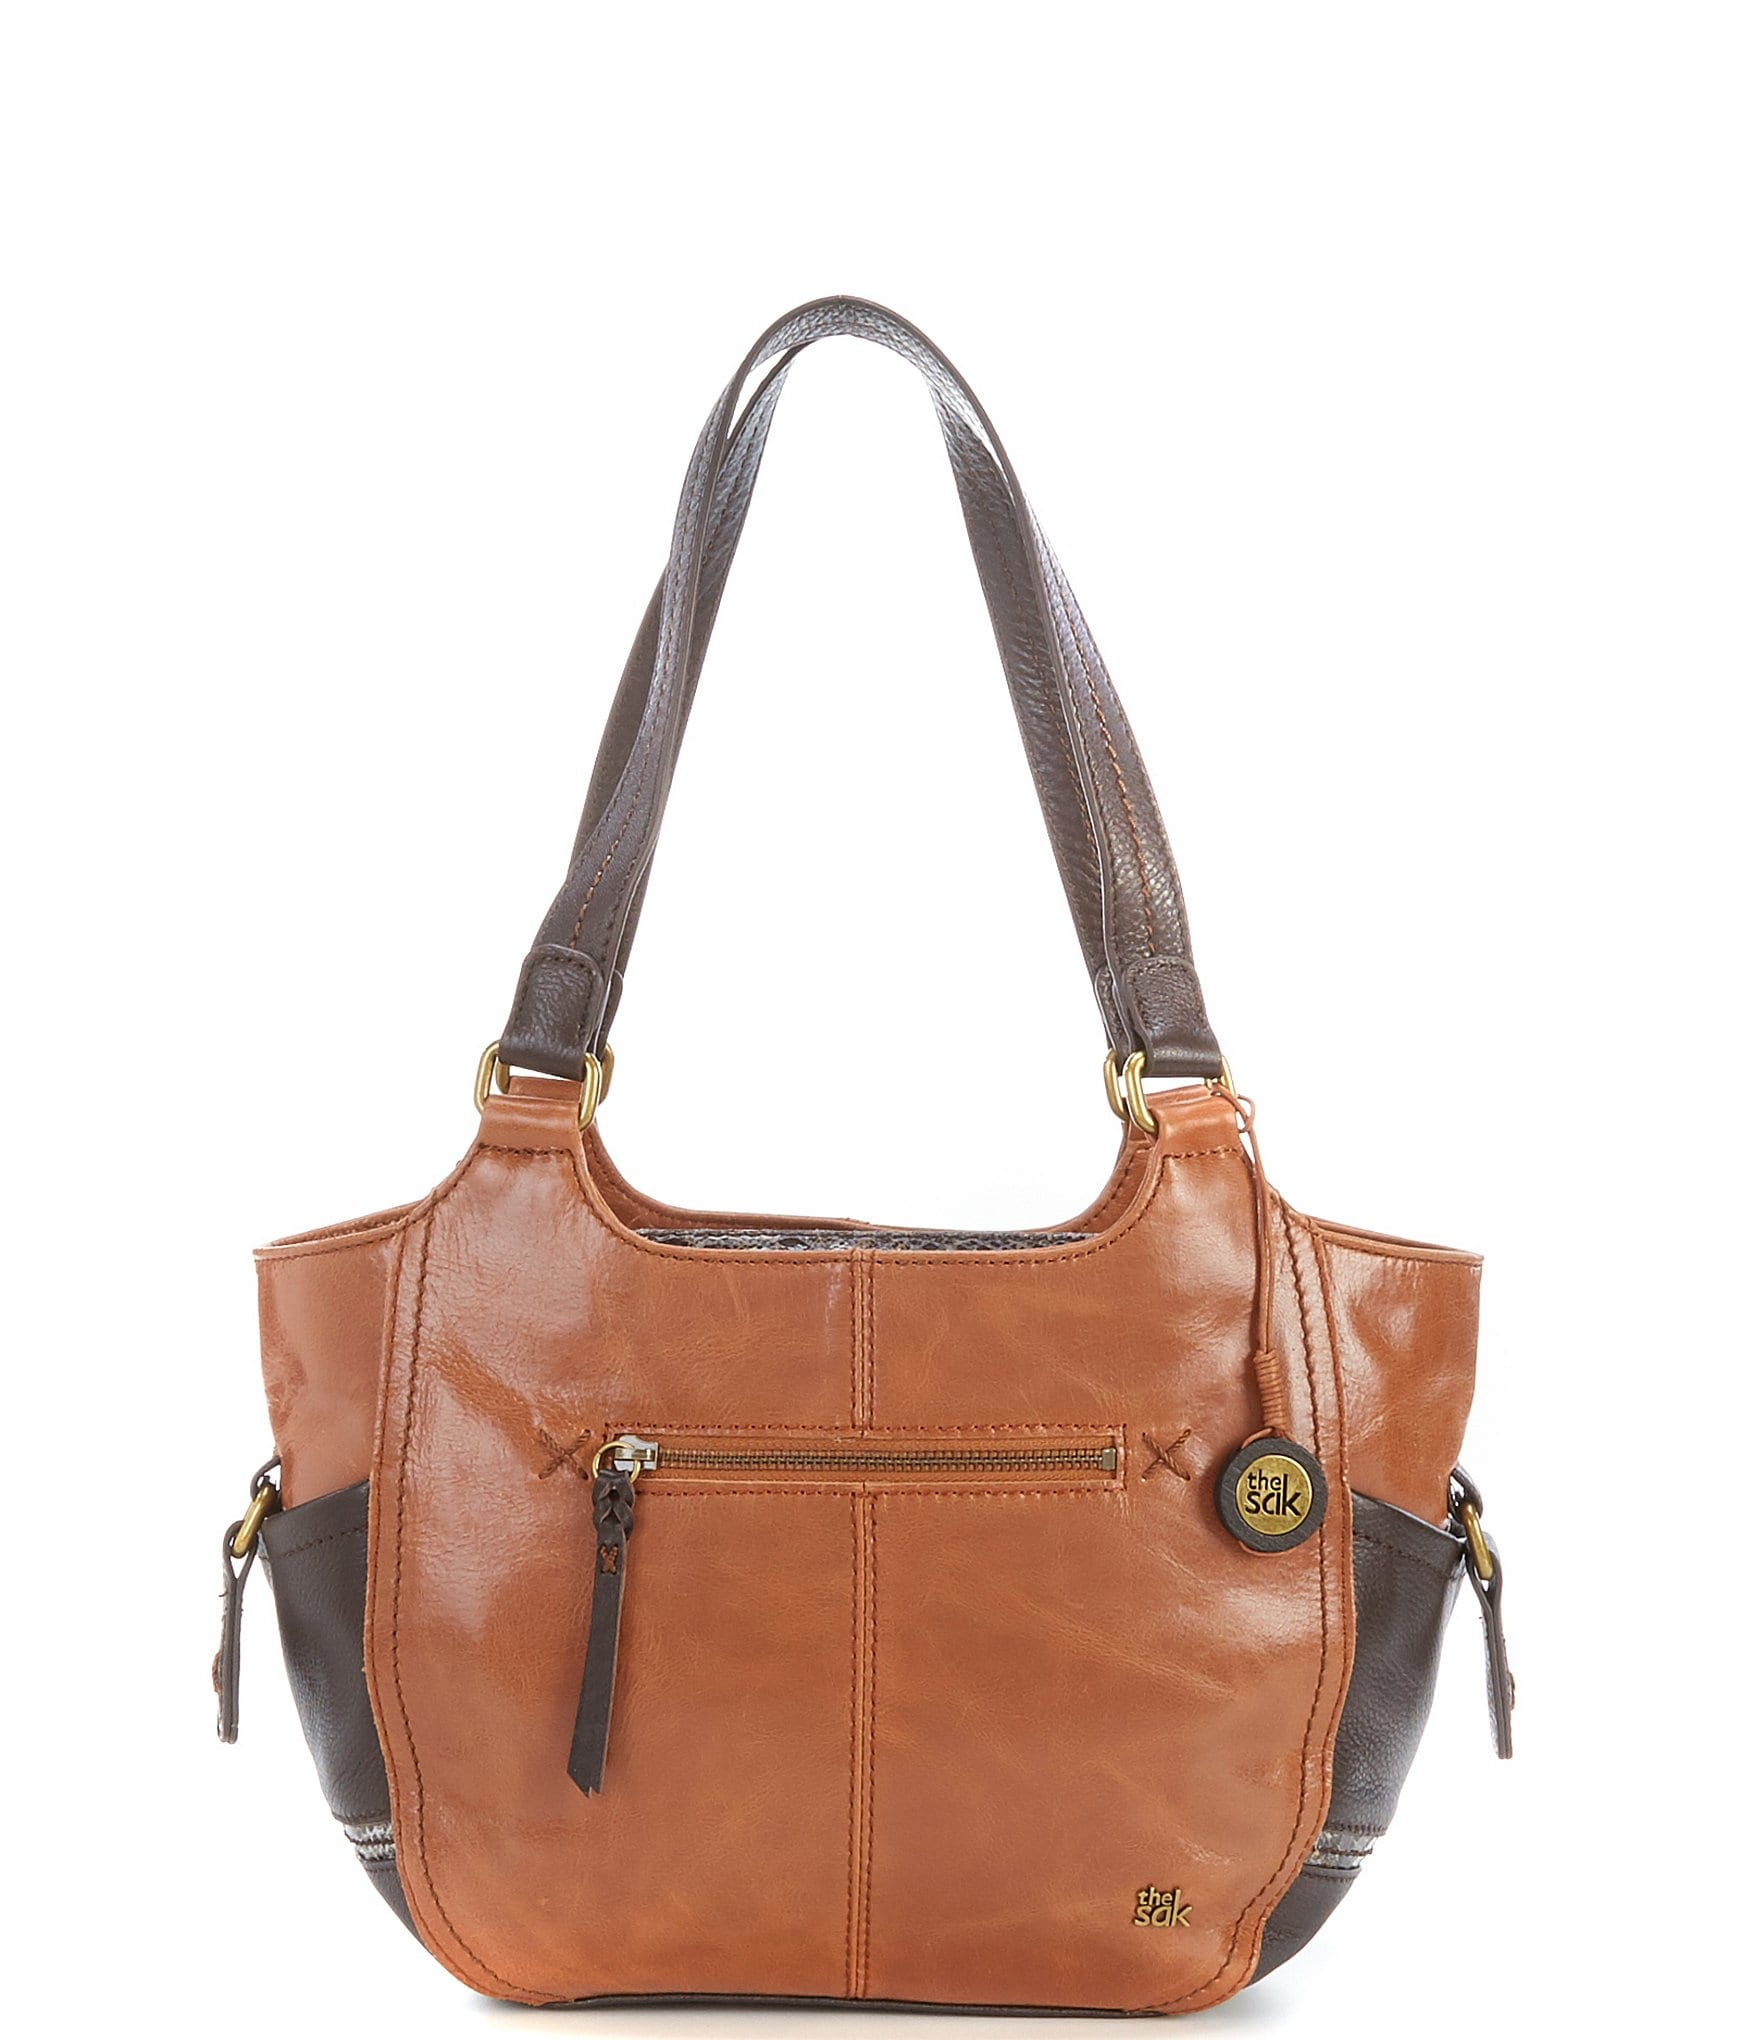 The Sak Leather Purse Best Image Ccdbb